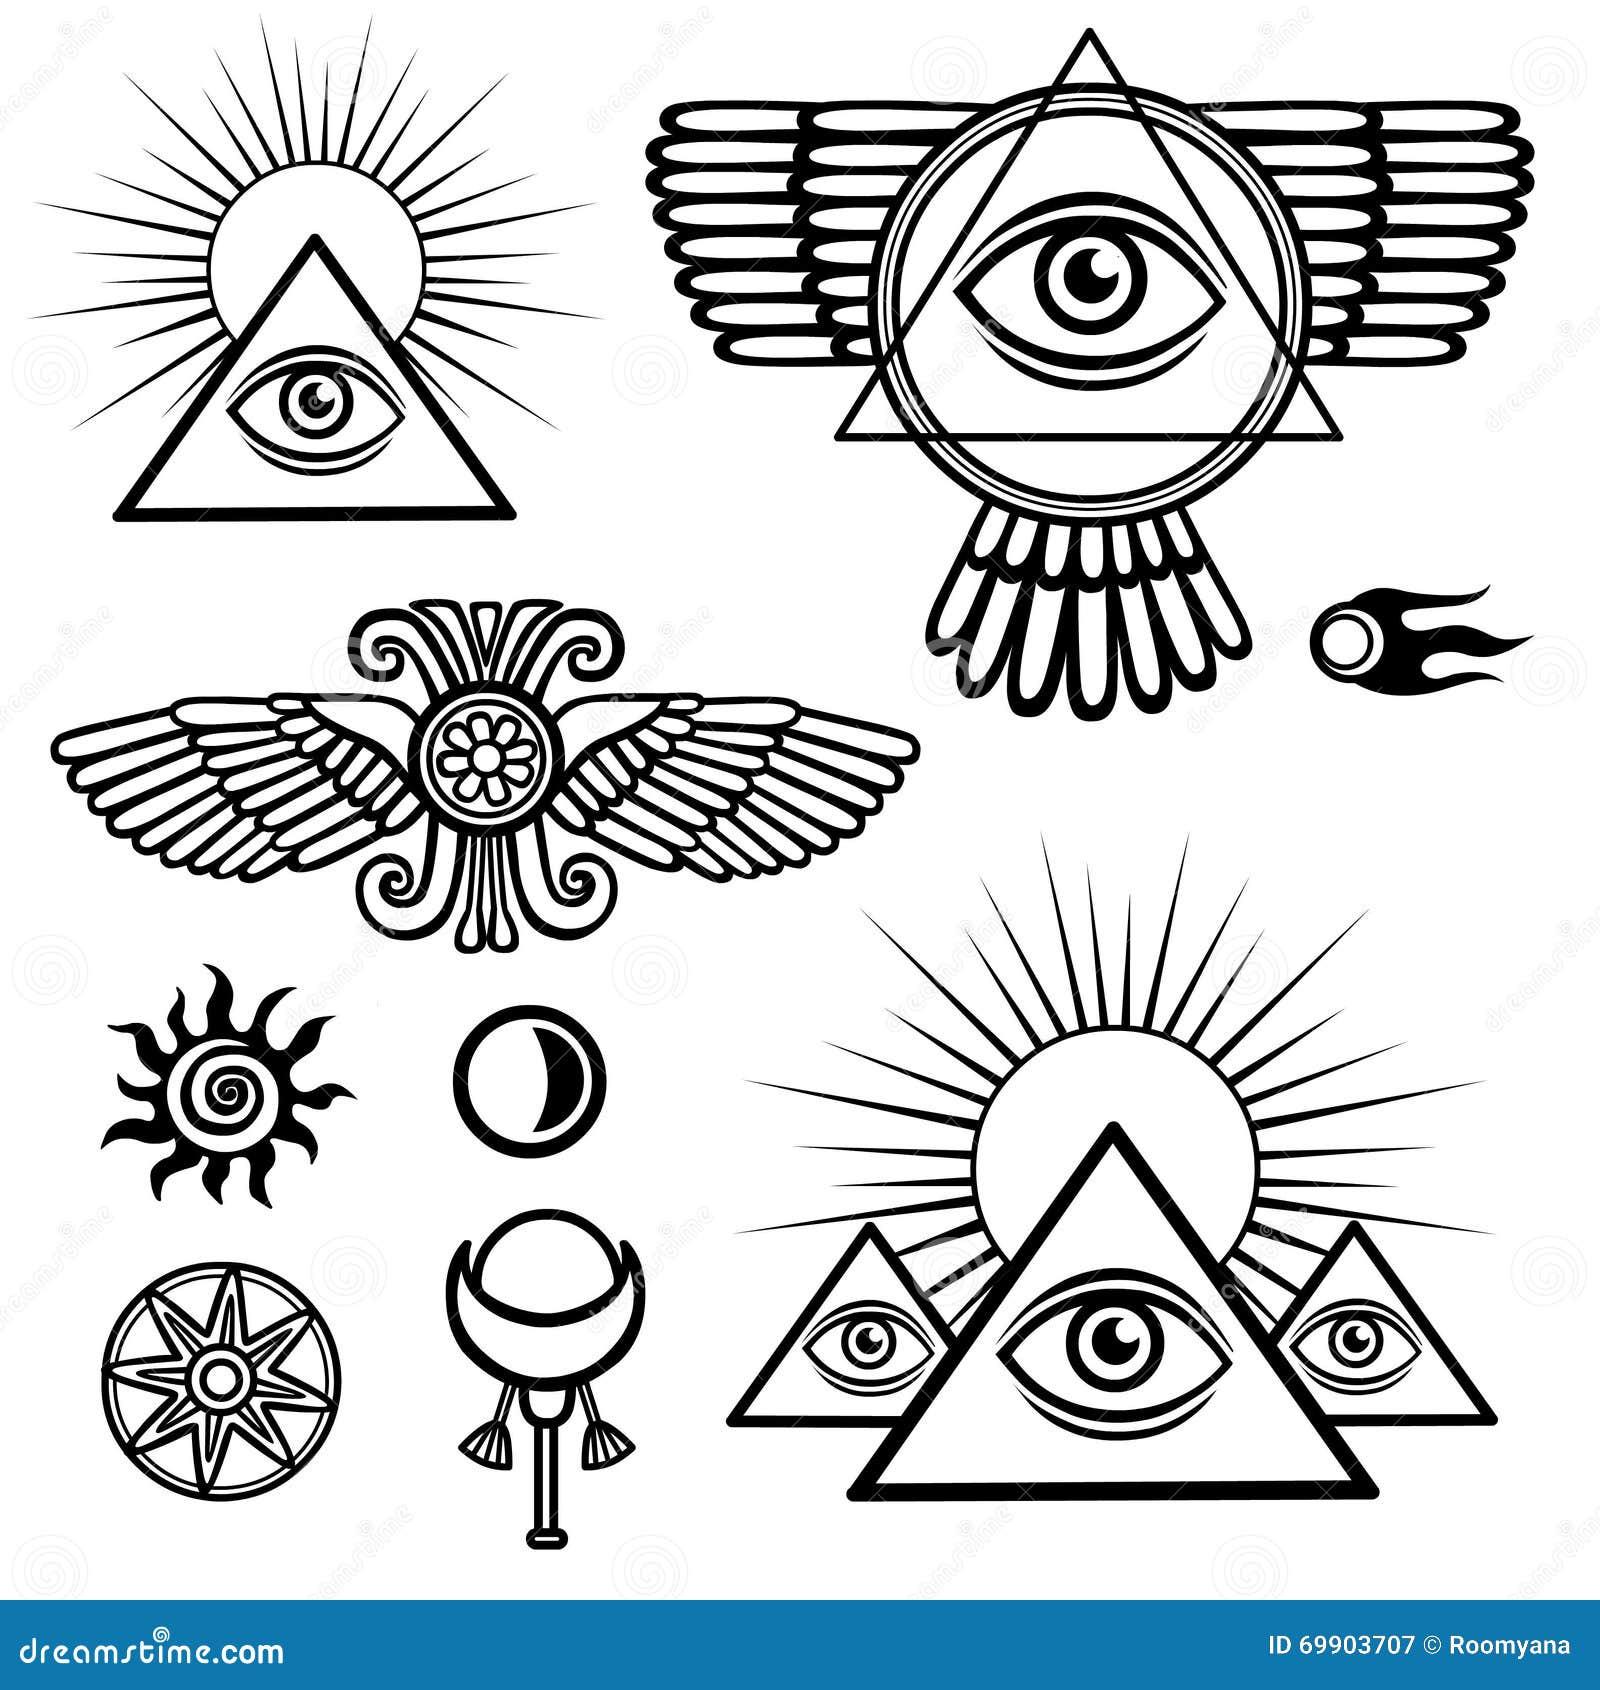 Комплект эзотерических символов: крыла, пирамида, глаз, луна, солнце, комета, звезда